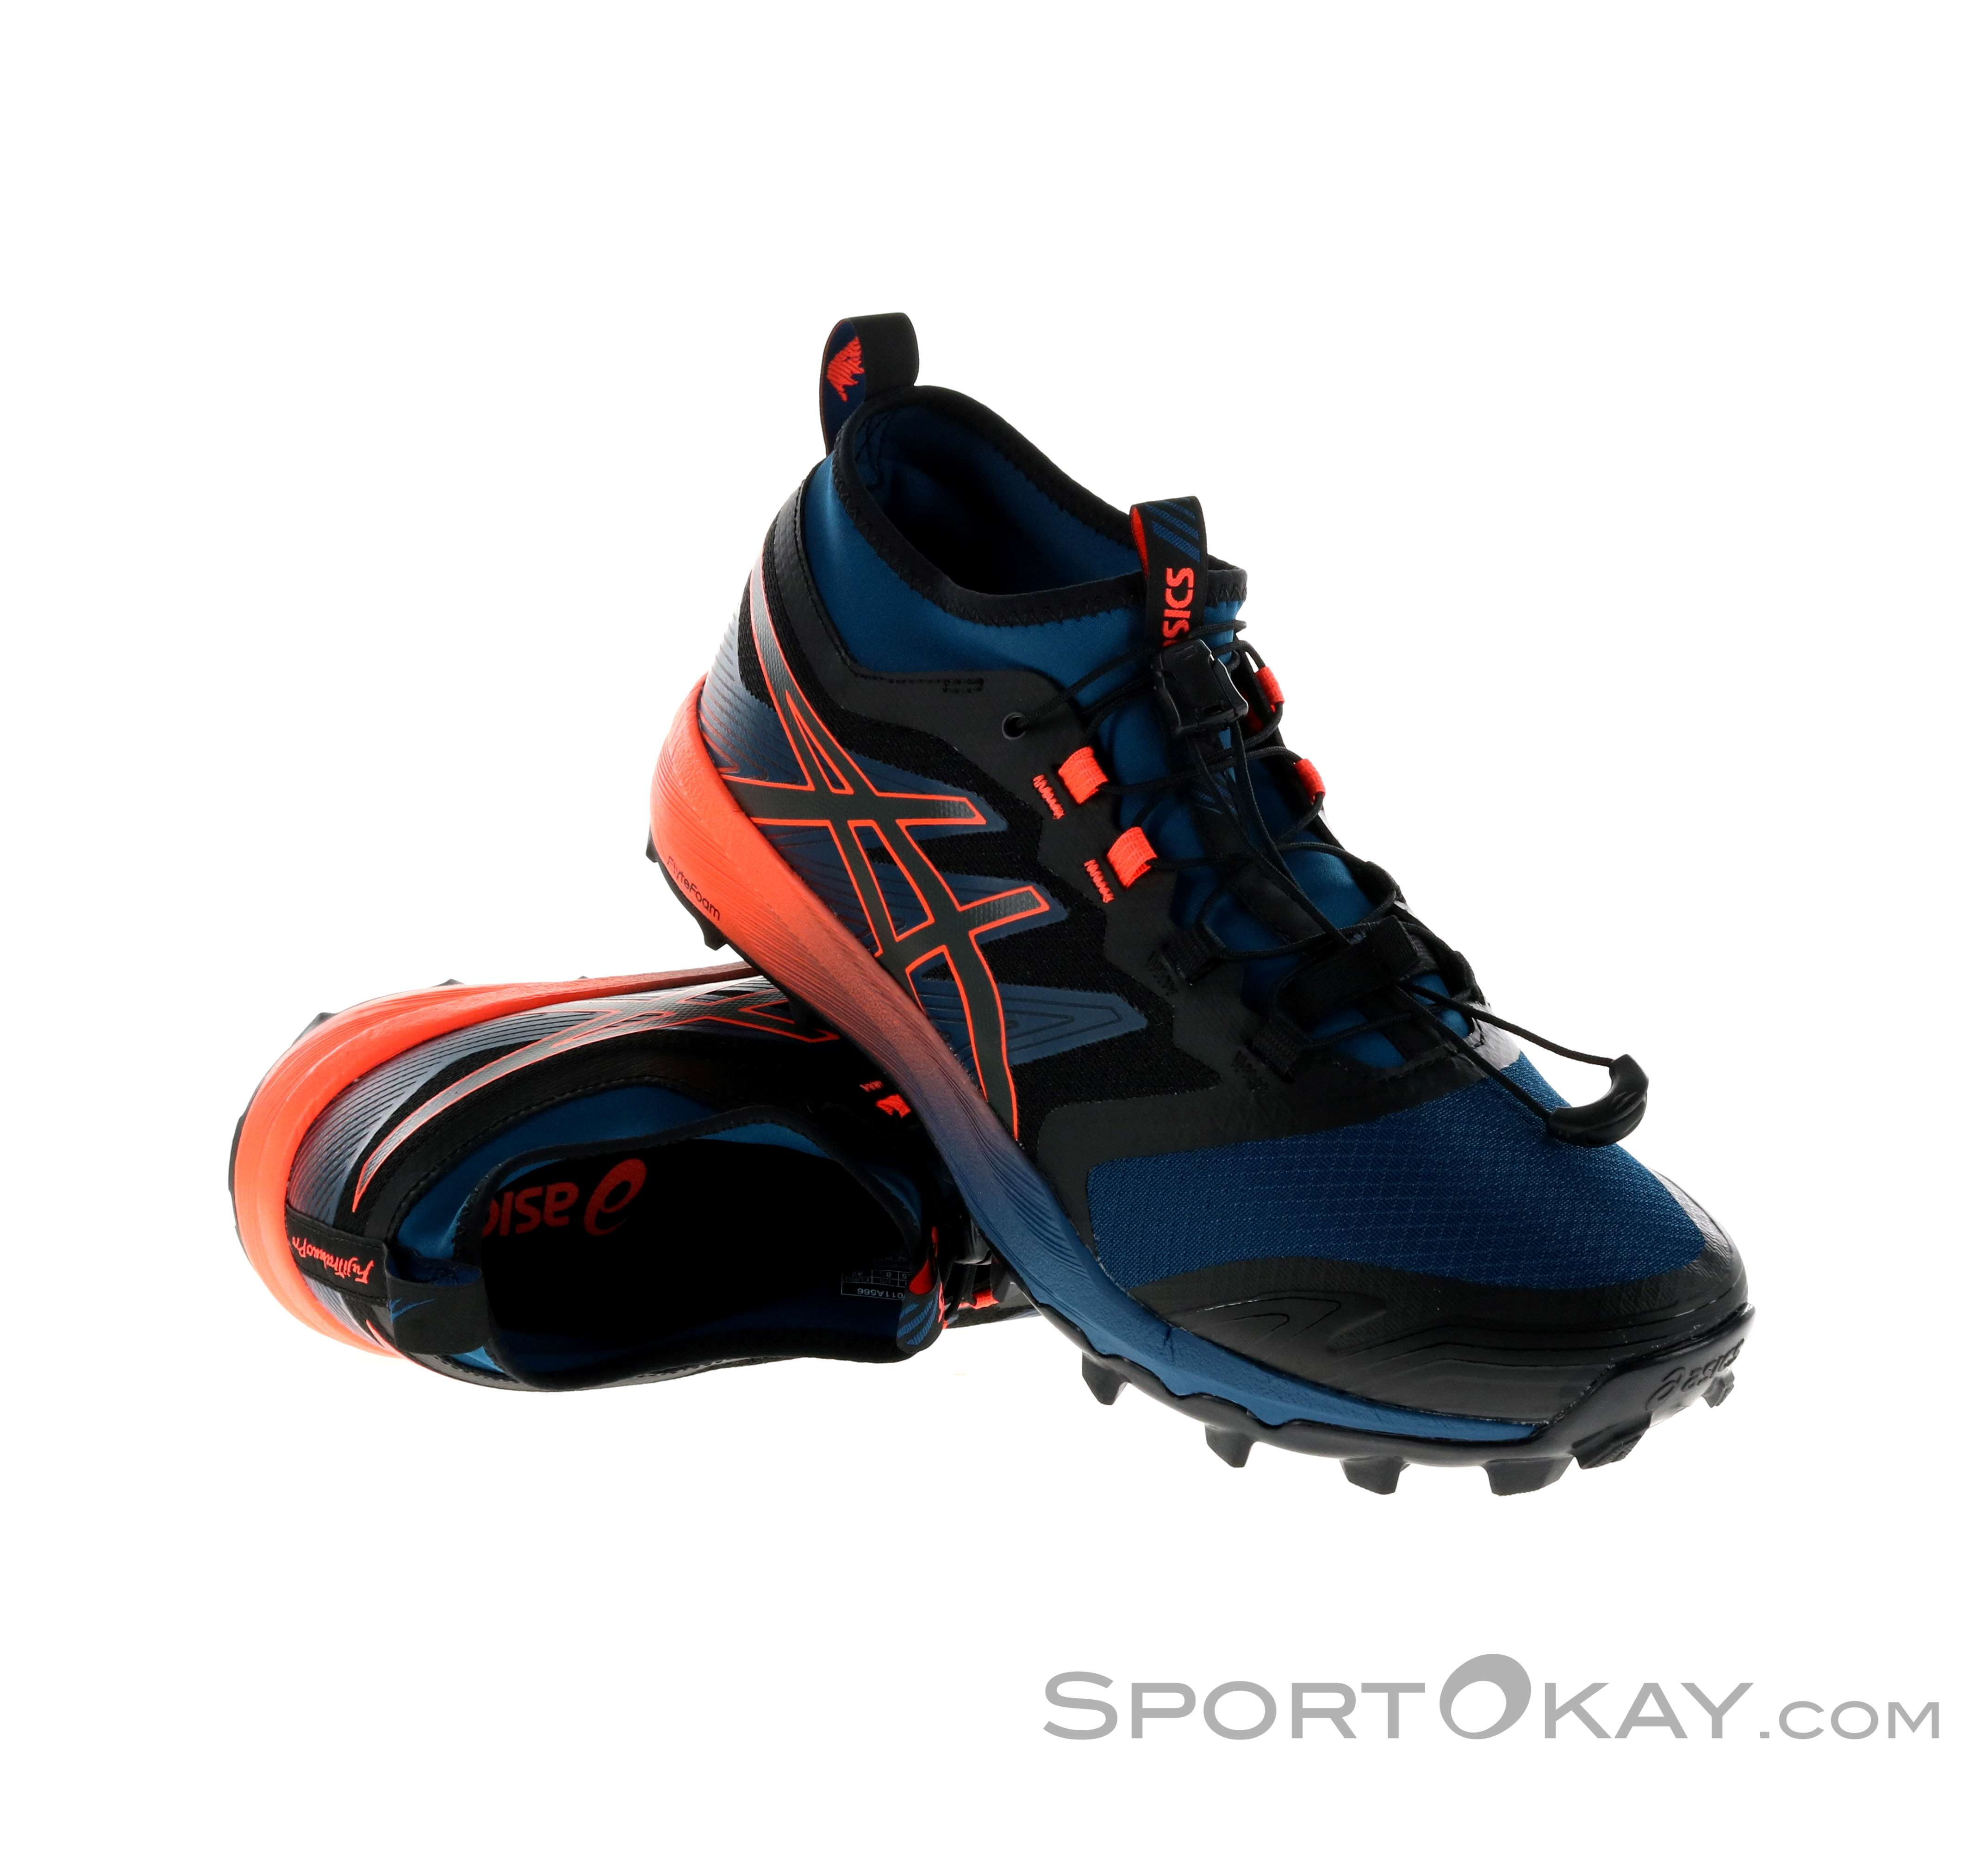 Asics Asics Fujitrabuco Pro Mens Trail Running Shoes